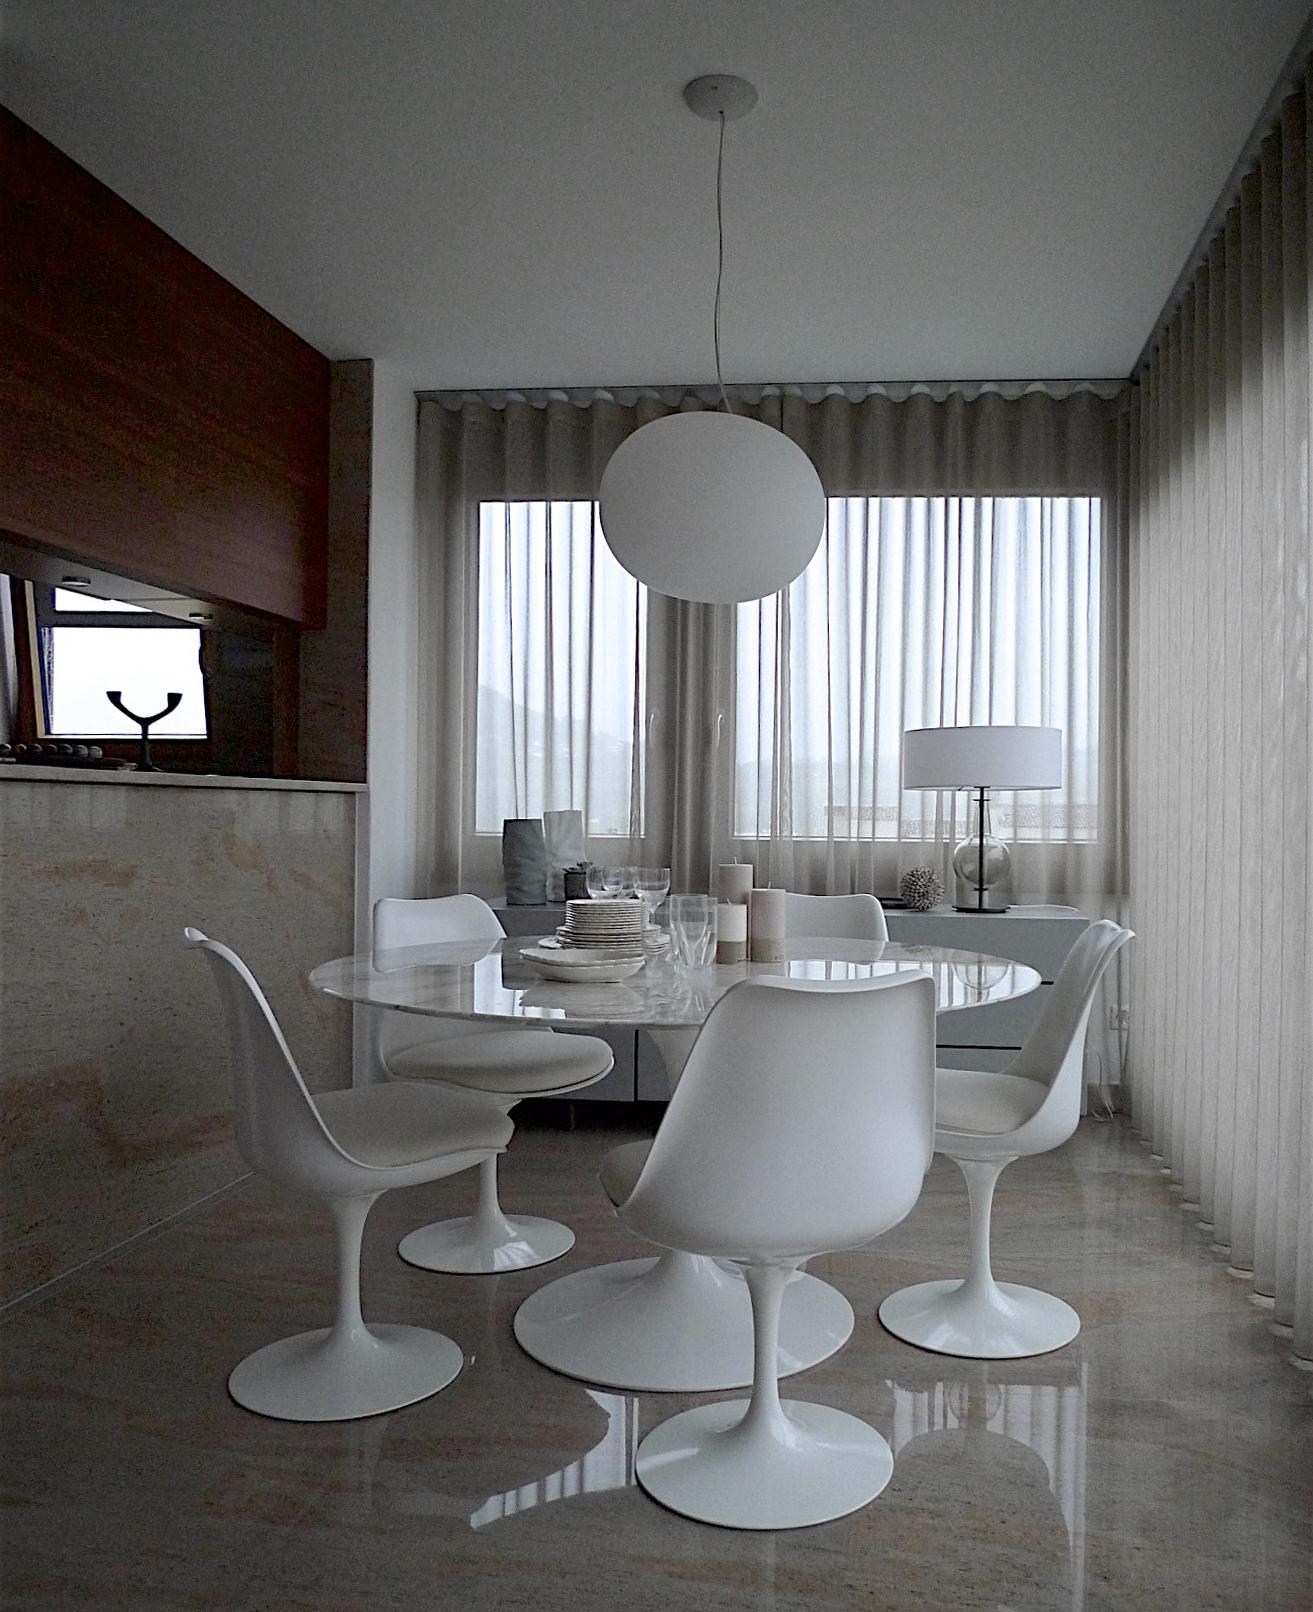 10 Agno interior design decor restyling details mdcreativelab